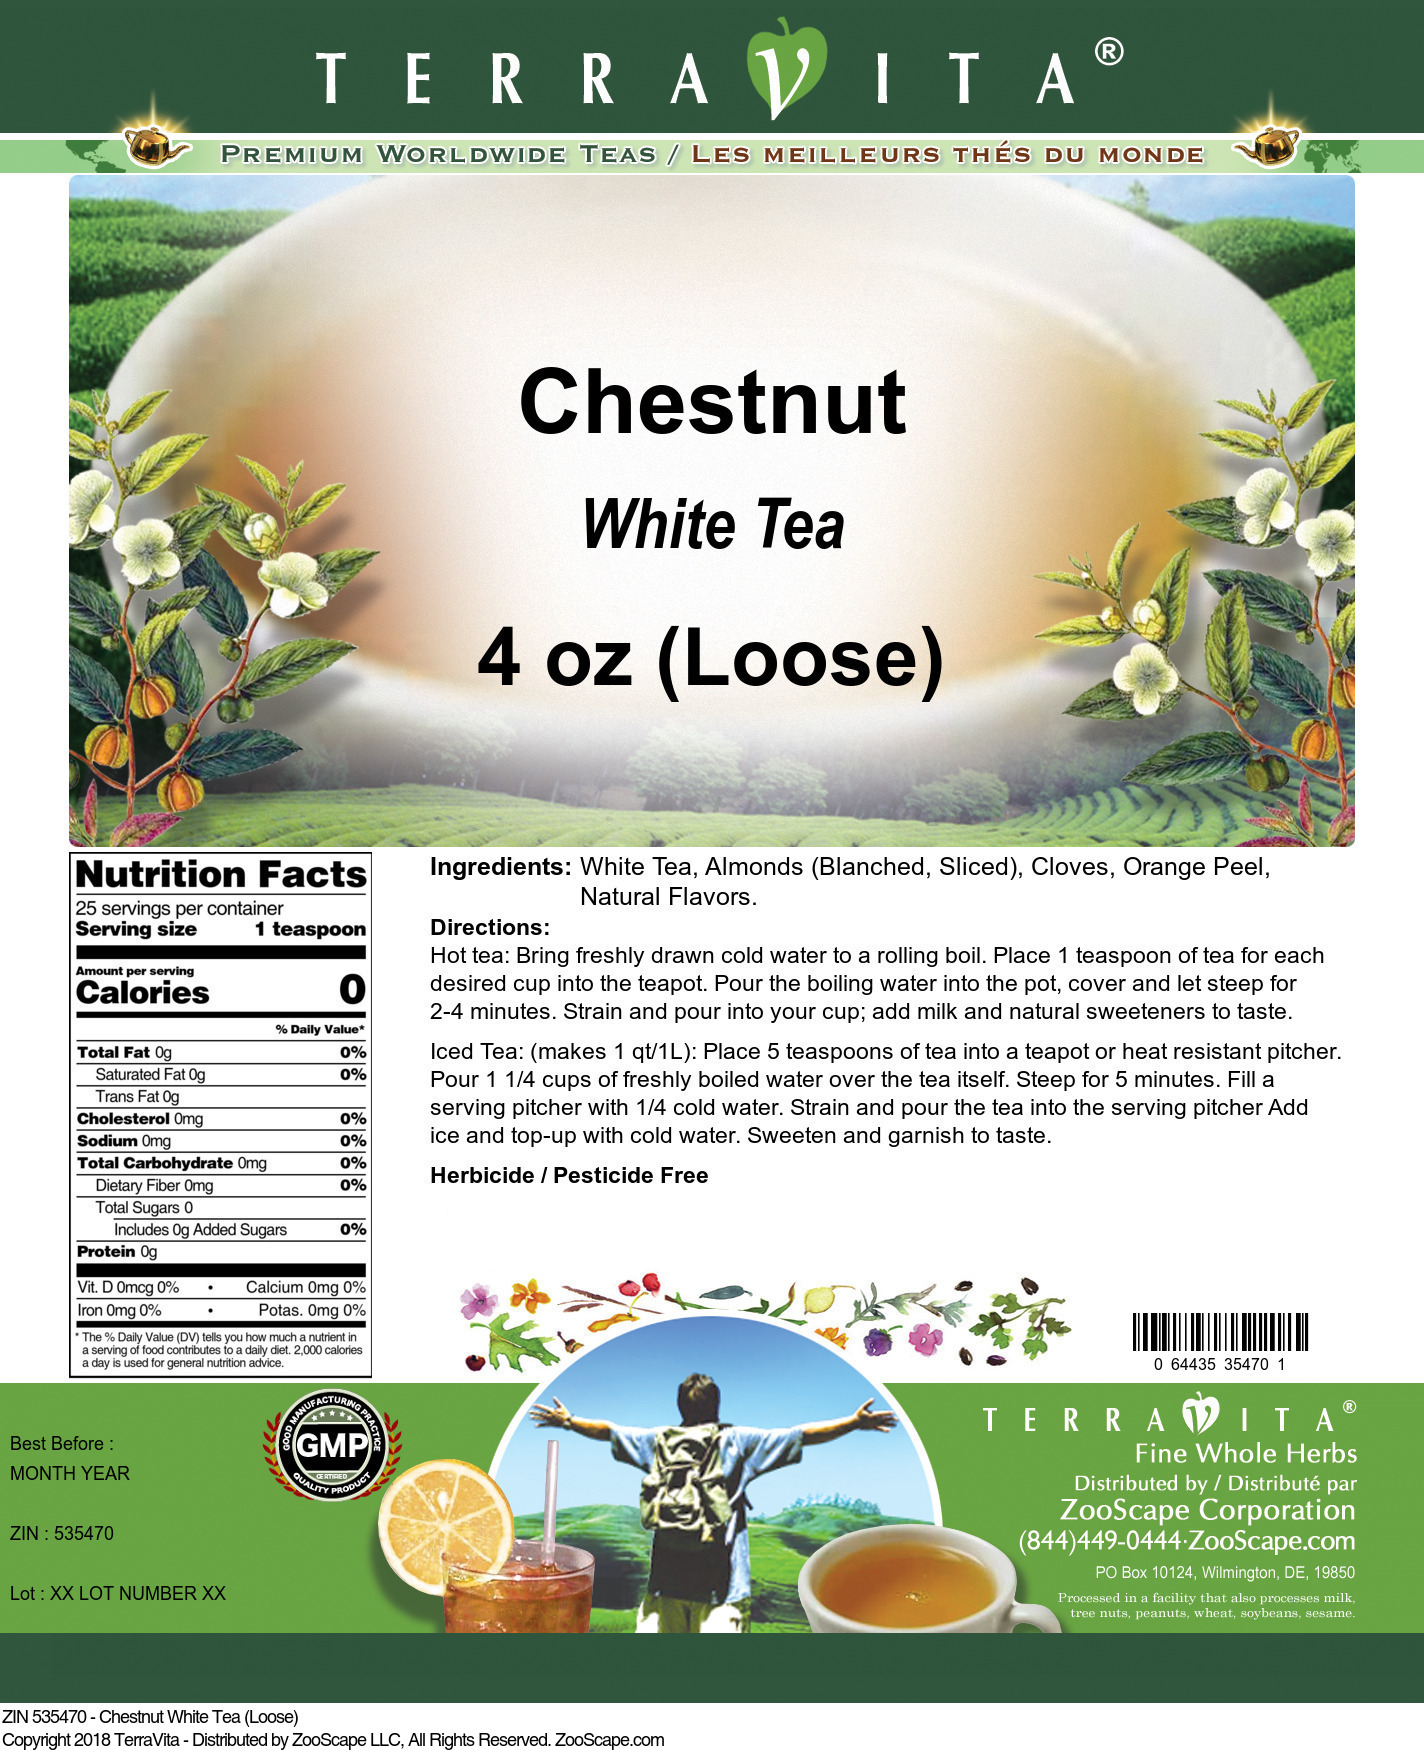 Chestnut White Tea (Loose)